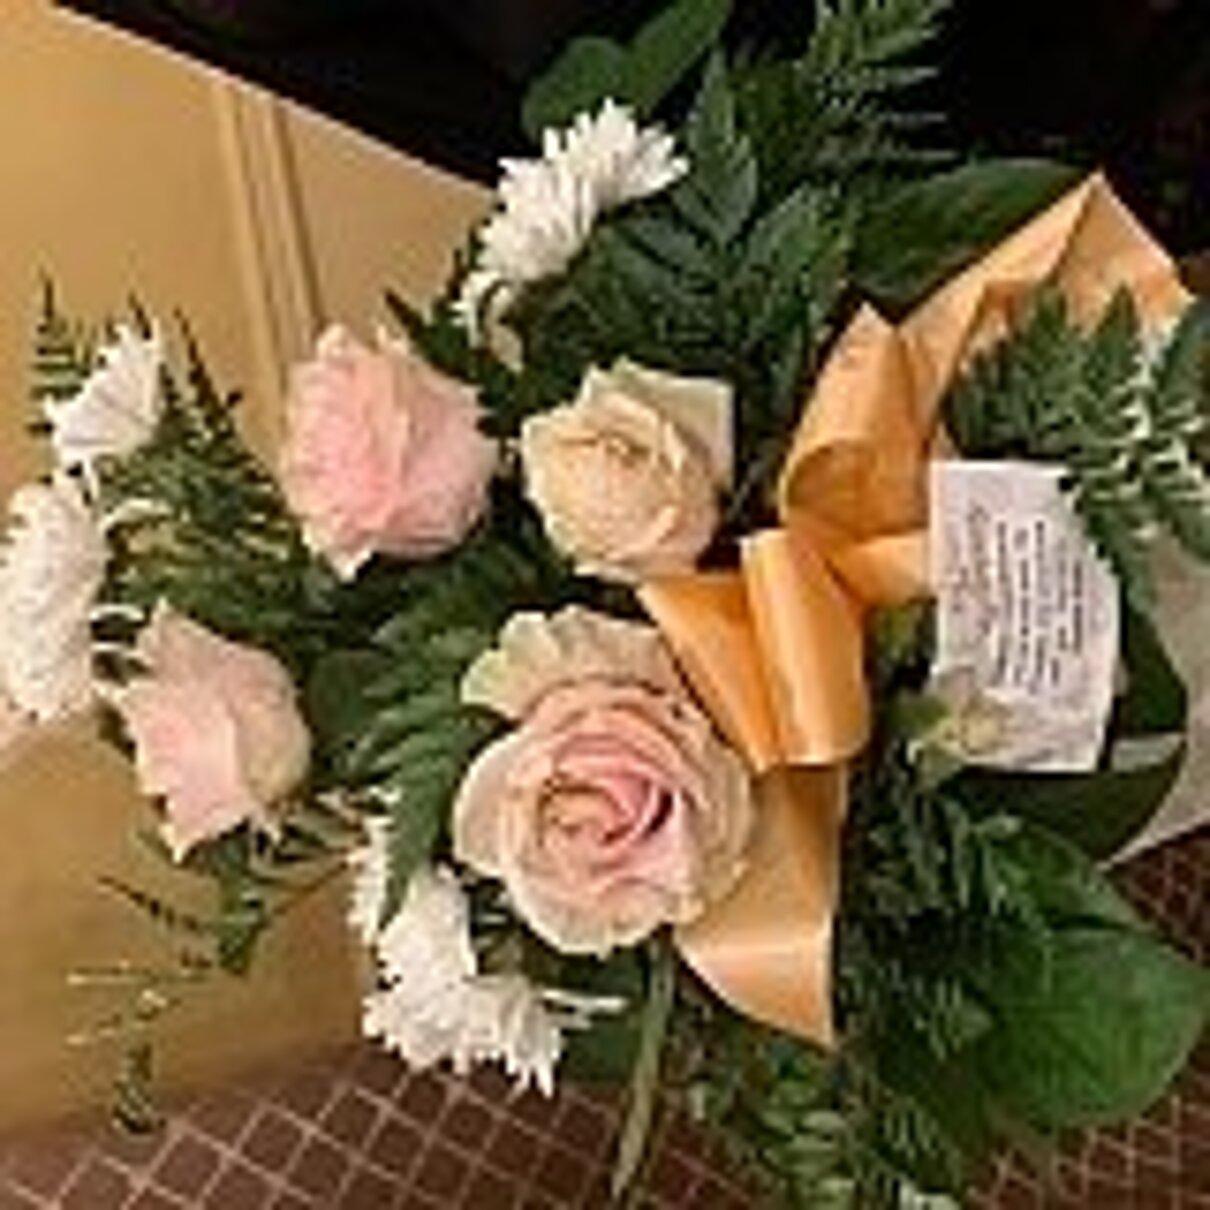 Complaint-review: 24sendflowers.com - Flowers not fresh. Photo #3